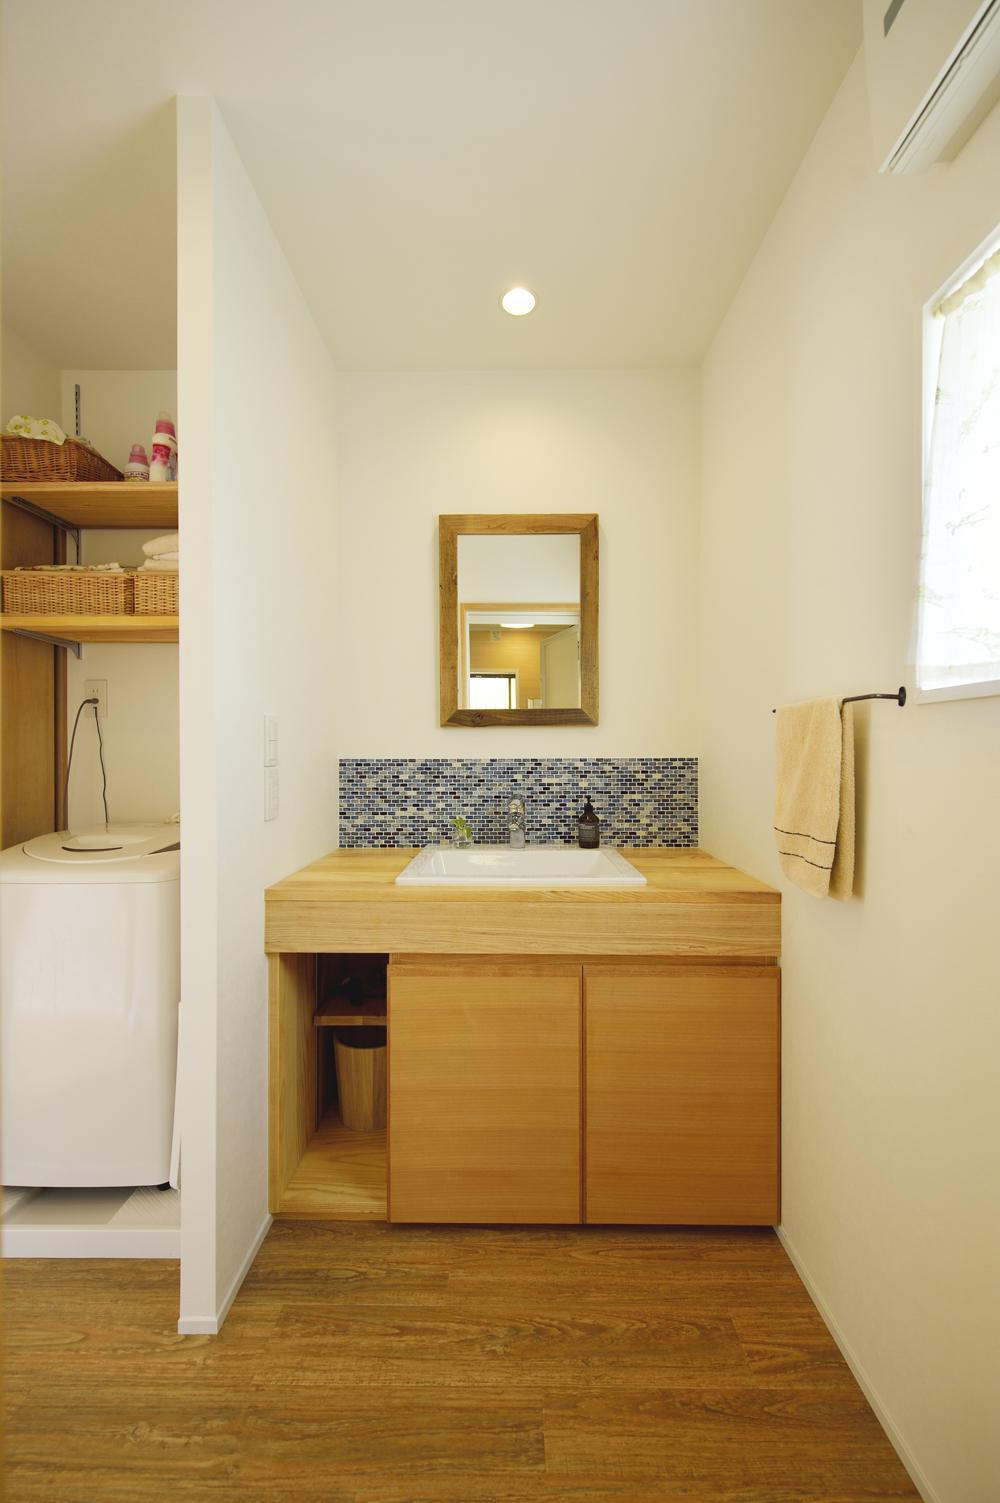 S邸・「解放感!」吹き抜けのある家の写真 ブルータイルがアクセントの洗面スペース